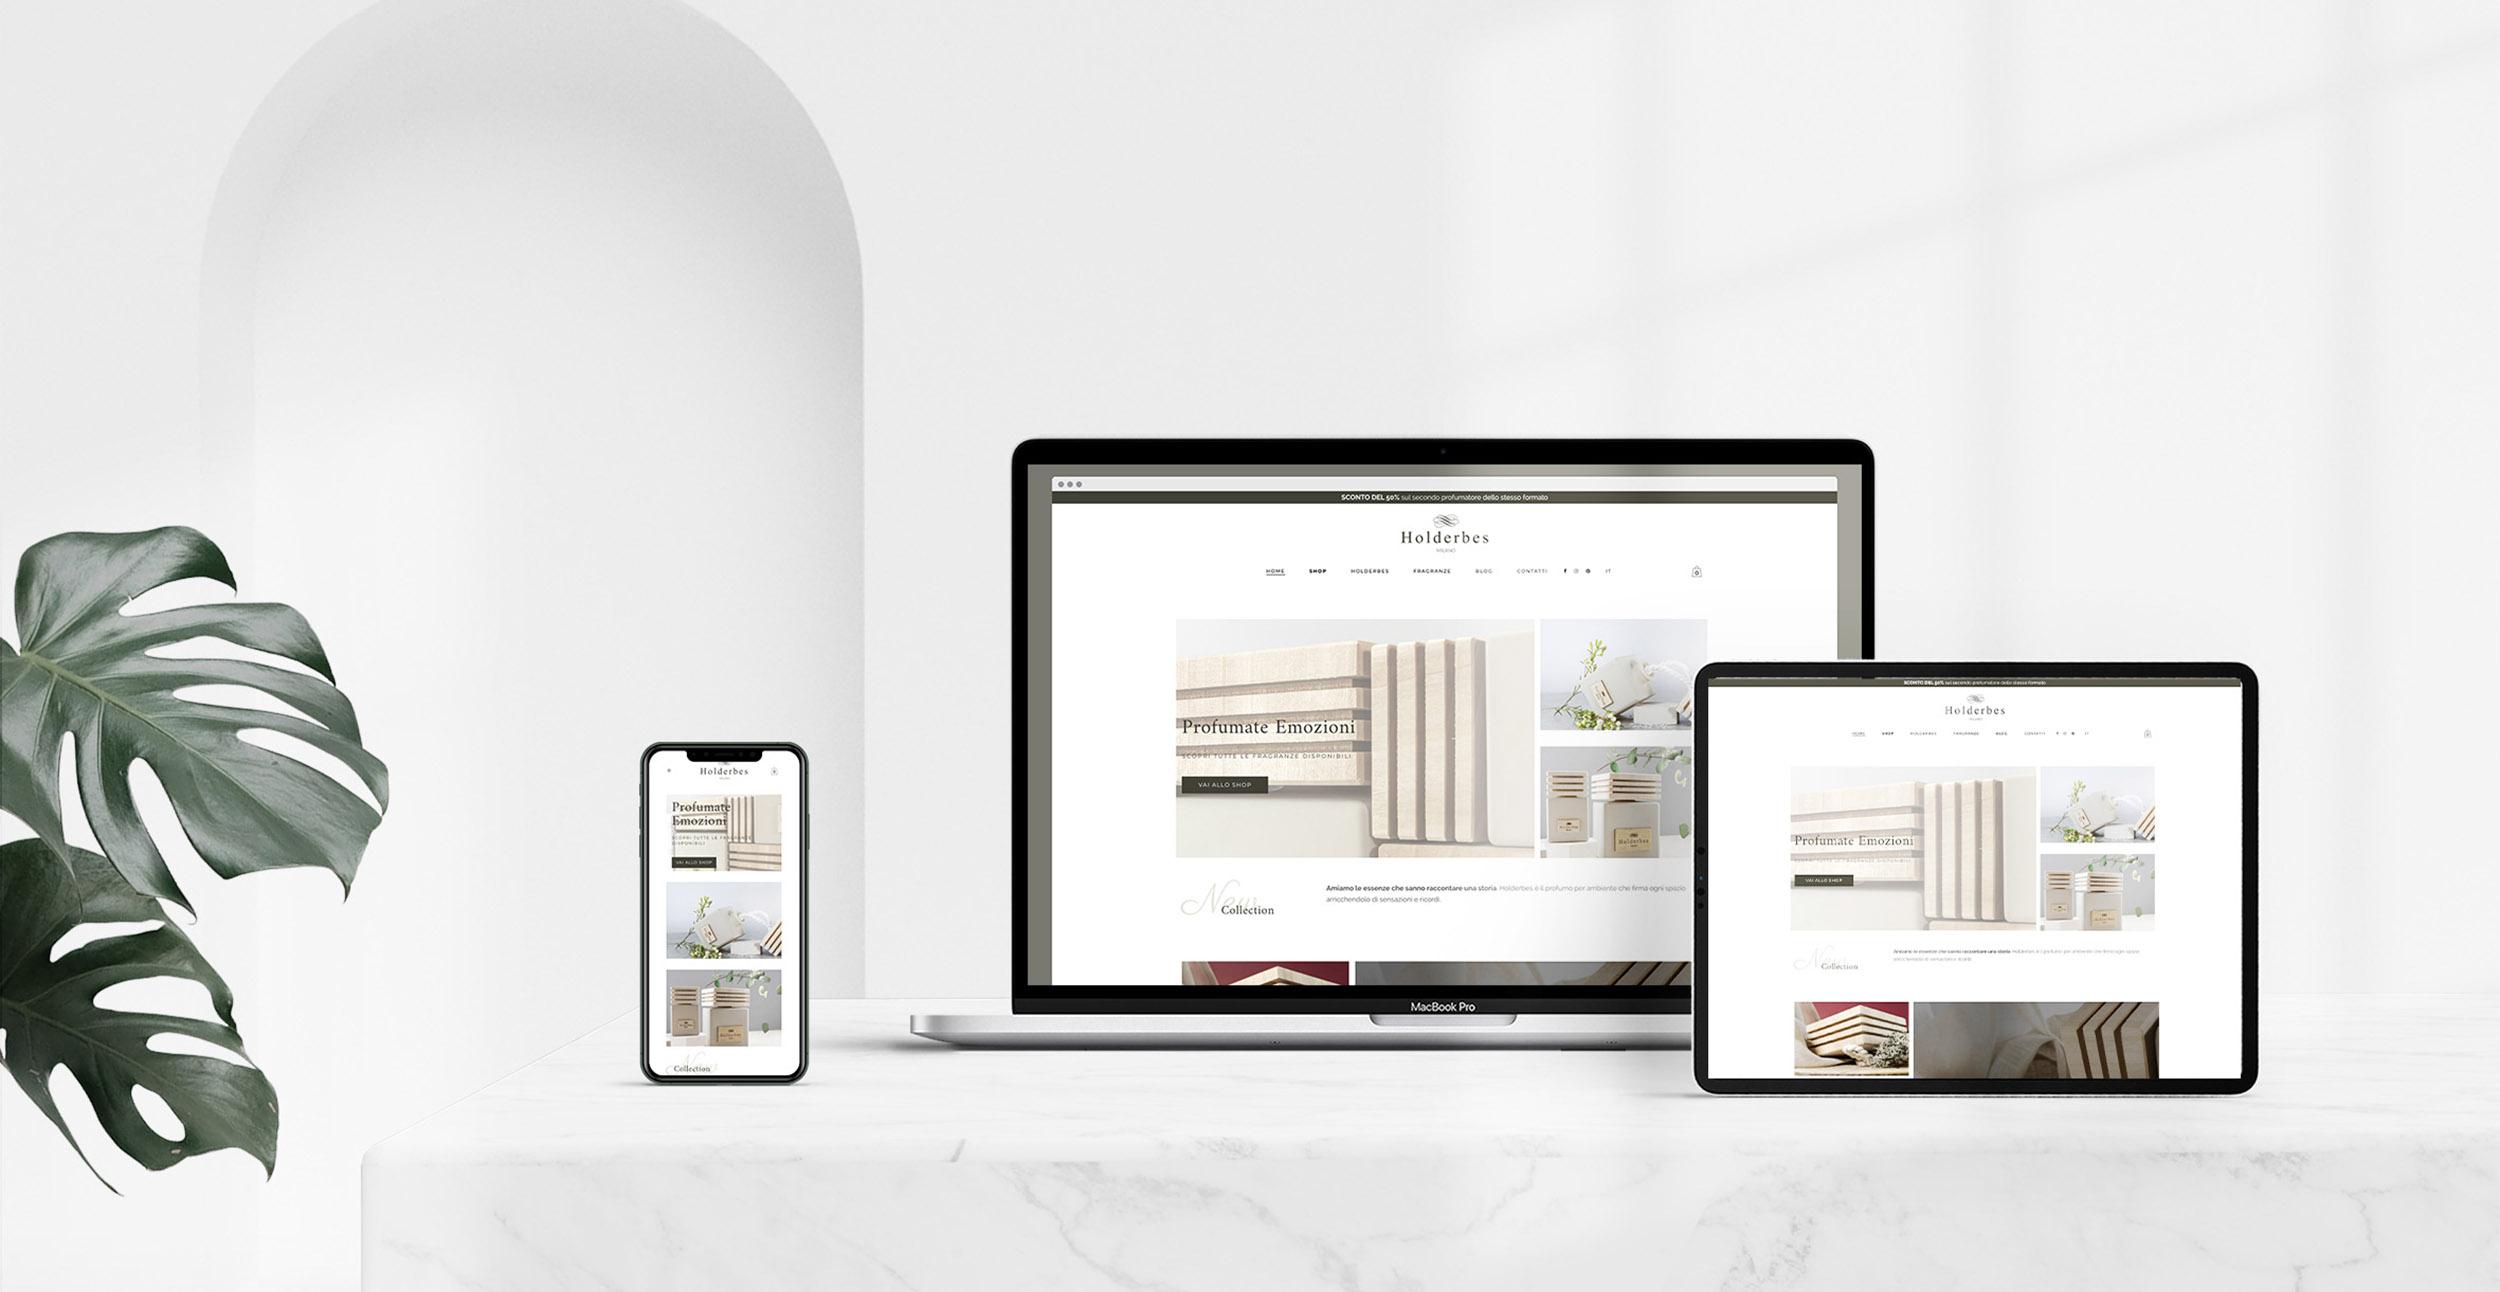 KFDS - Holderbes Case Study E-commerce